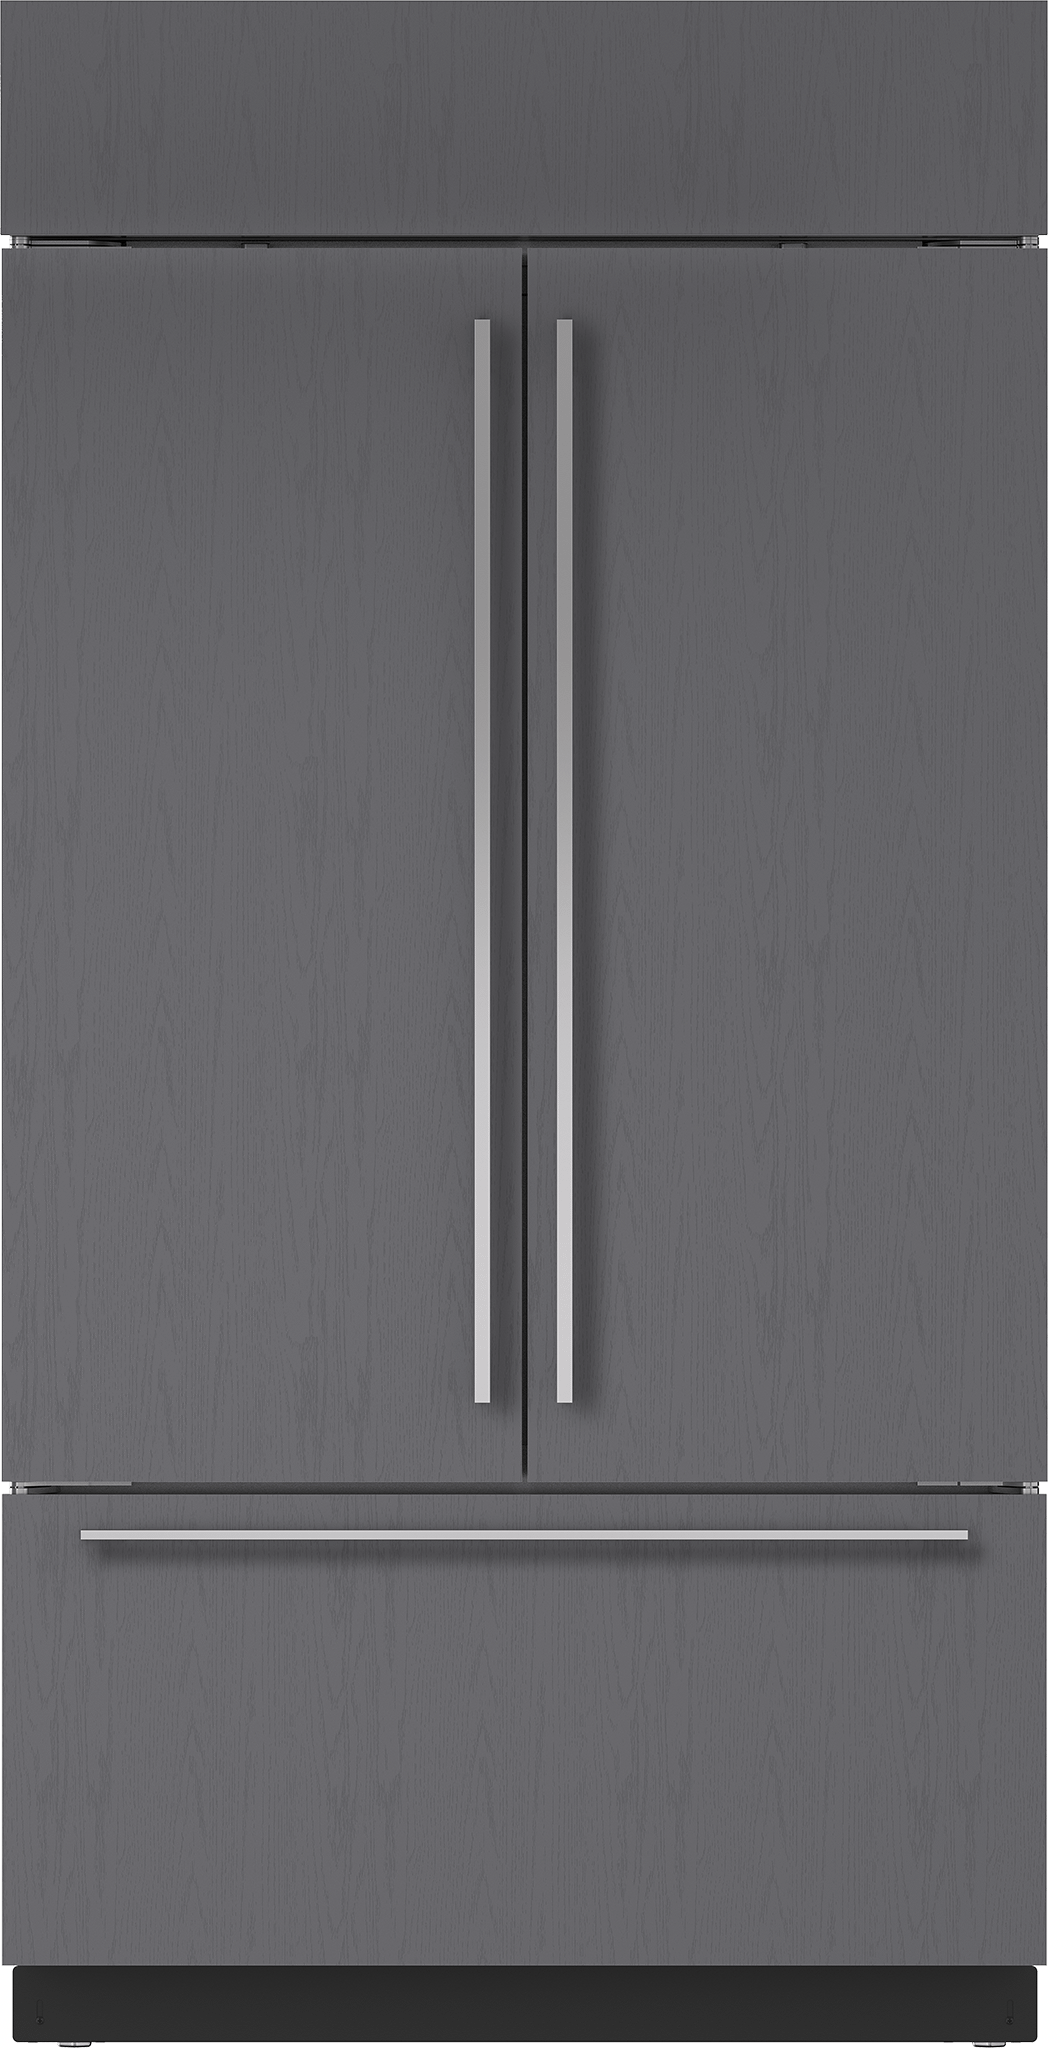 "Subzero42"" Classic French Door Refrigerator/freezer With Internal Dispenser - Panel Ready"